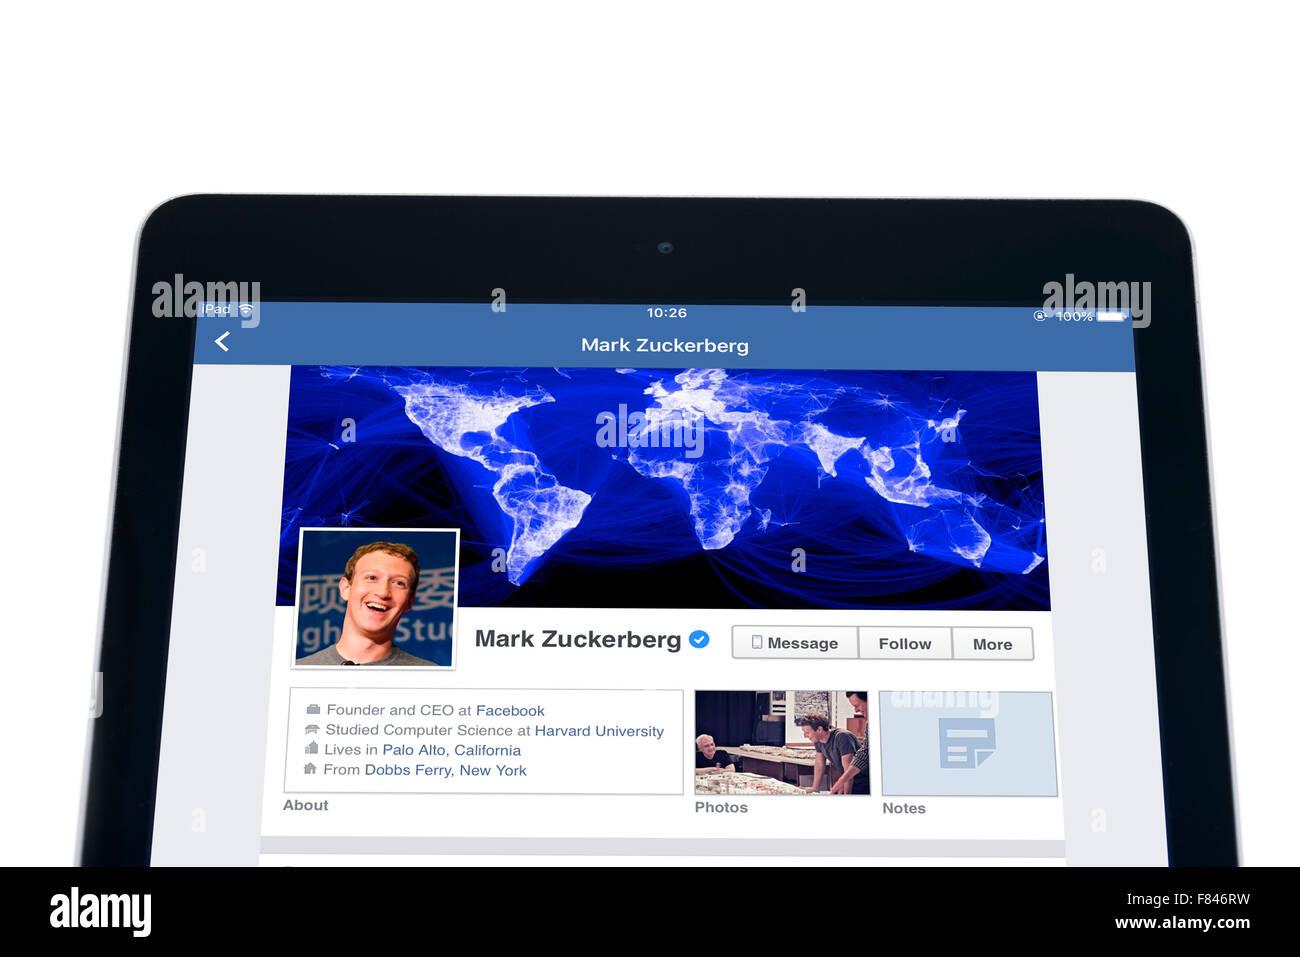 Le site web de Mark Zuckerberg sur l'application Facebook, vue sur un iPad Air Photo Stock